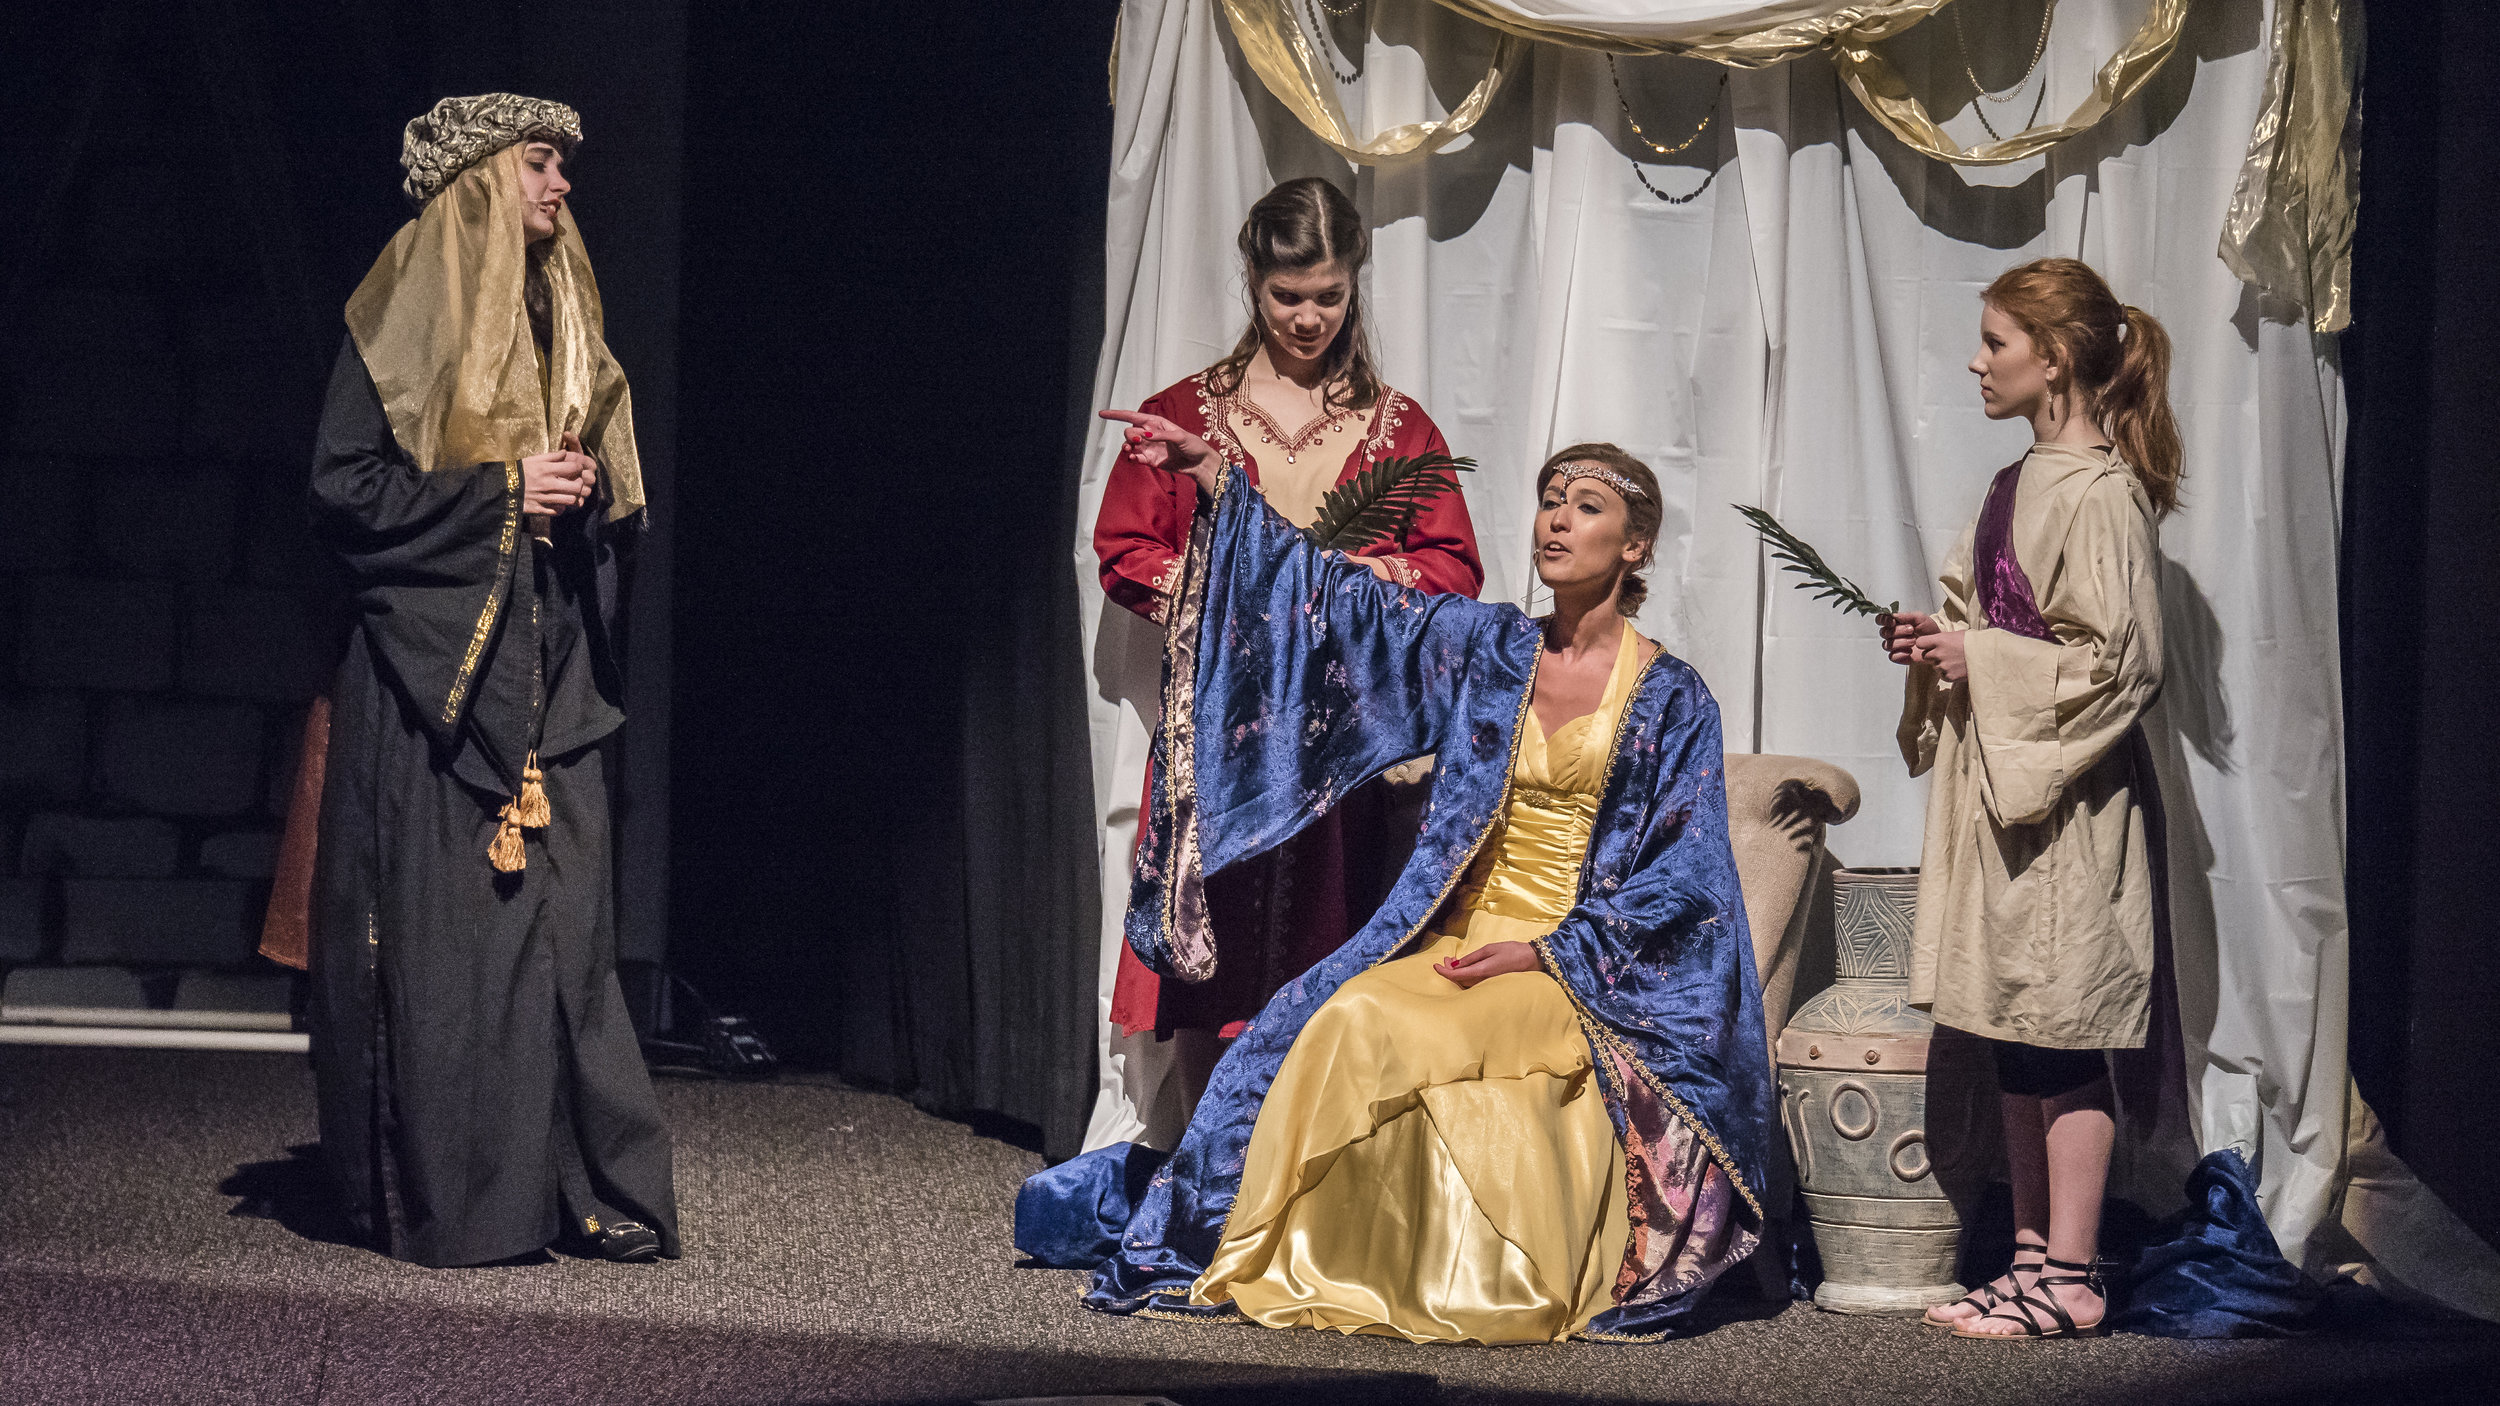 Queen Vashti - played by Shawna Hackl